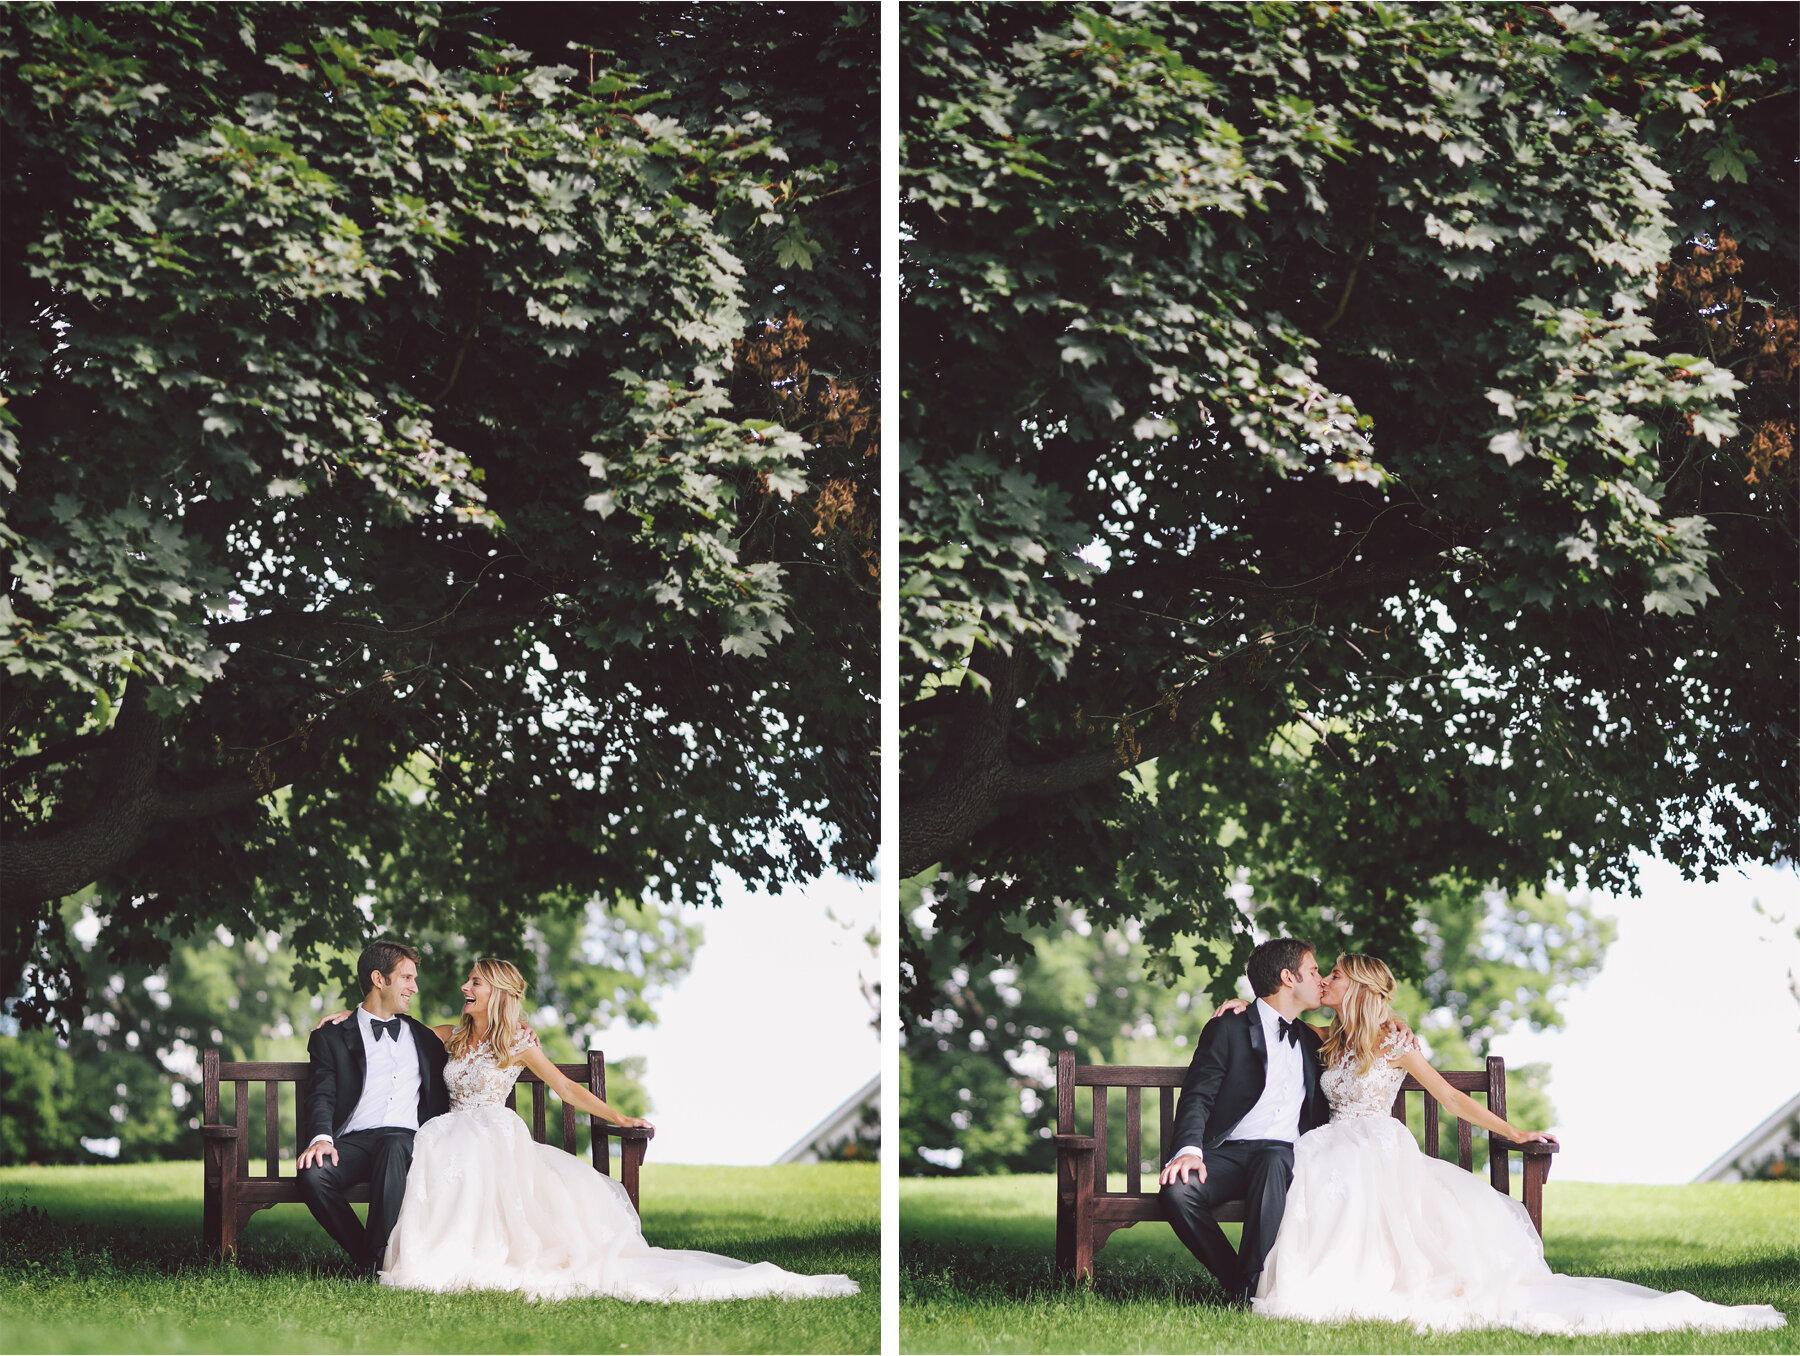 08 Wedding Vick Photography Minneapolis Minnesota Bride Groom Tree Bench Michelle and William.jpg